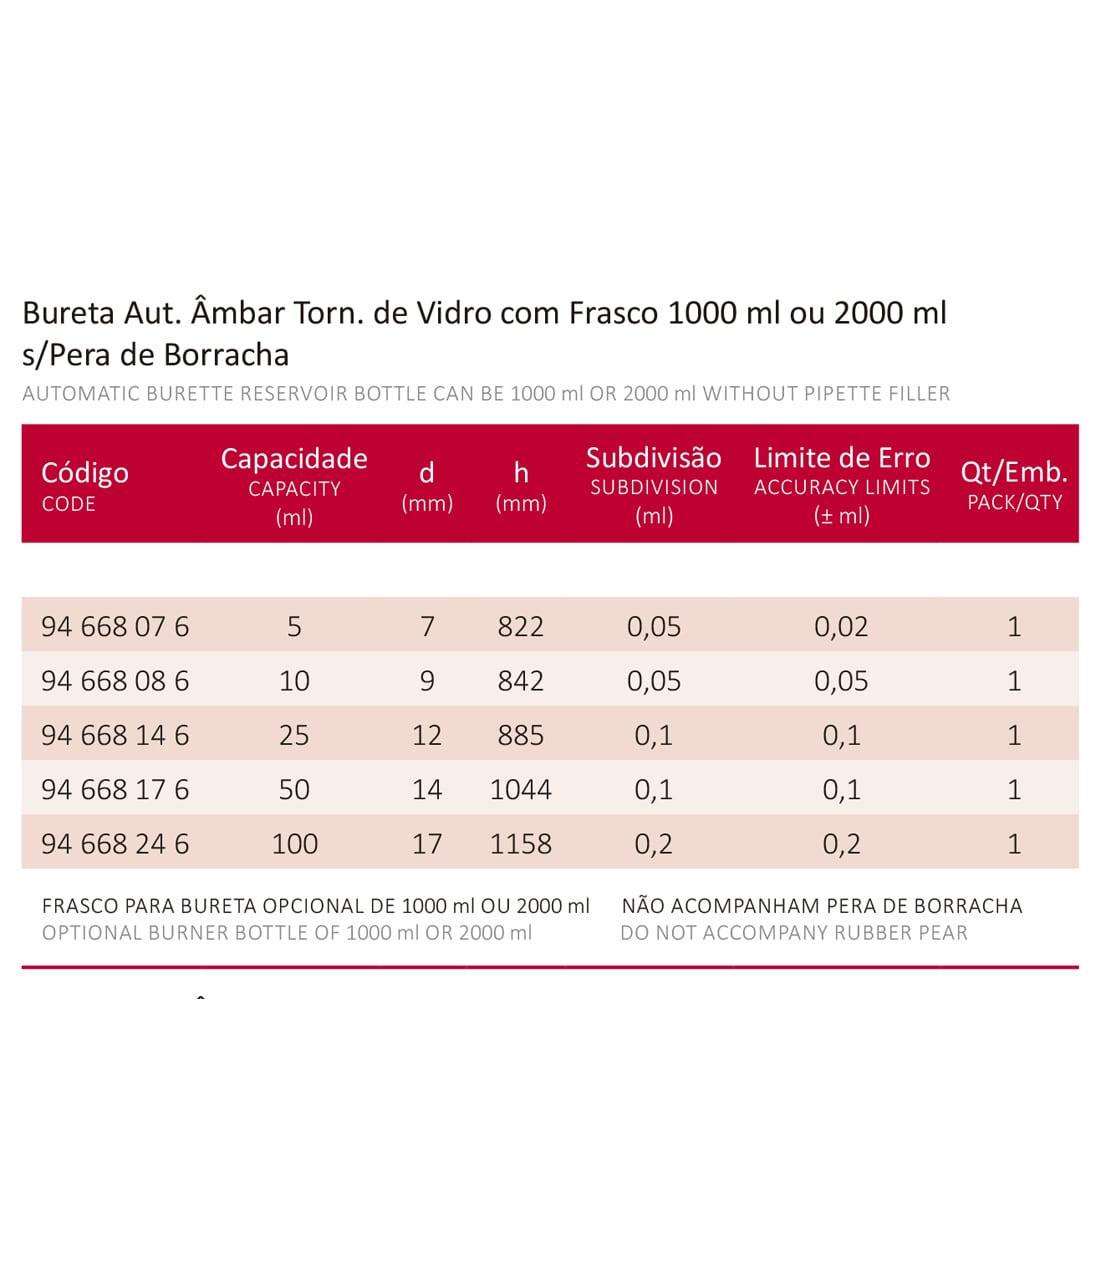 BURETA AUTOMÁTICA ÂMBAR TORN. DE VIDRO C/FRASCO 50 ML - Laborglas - 94668176